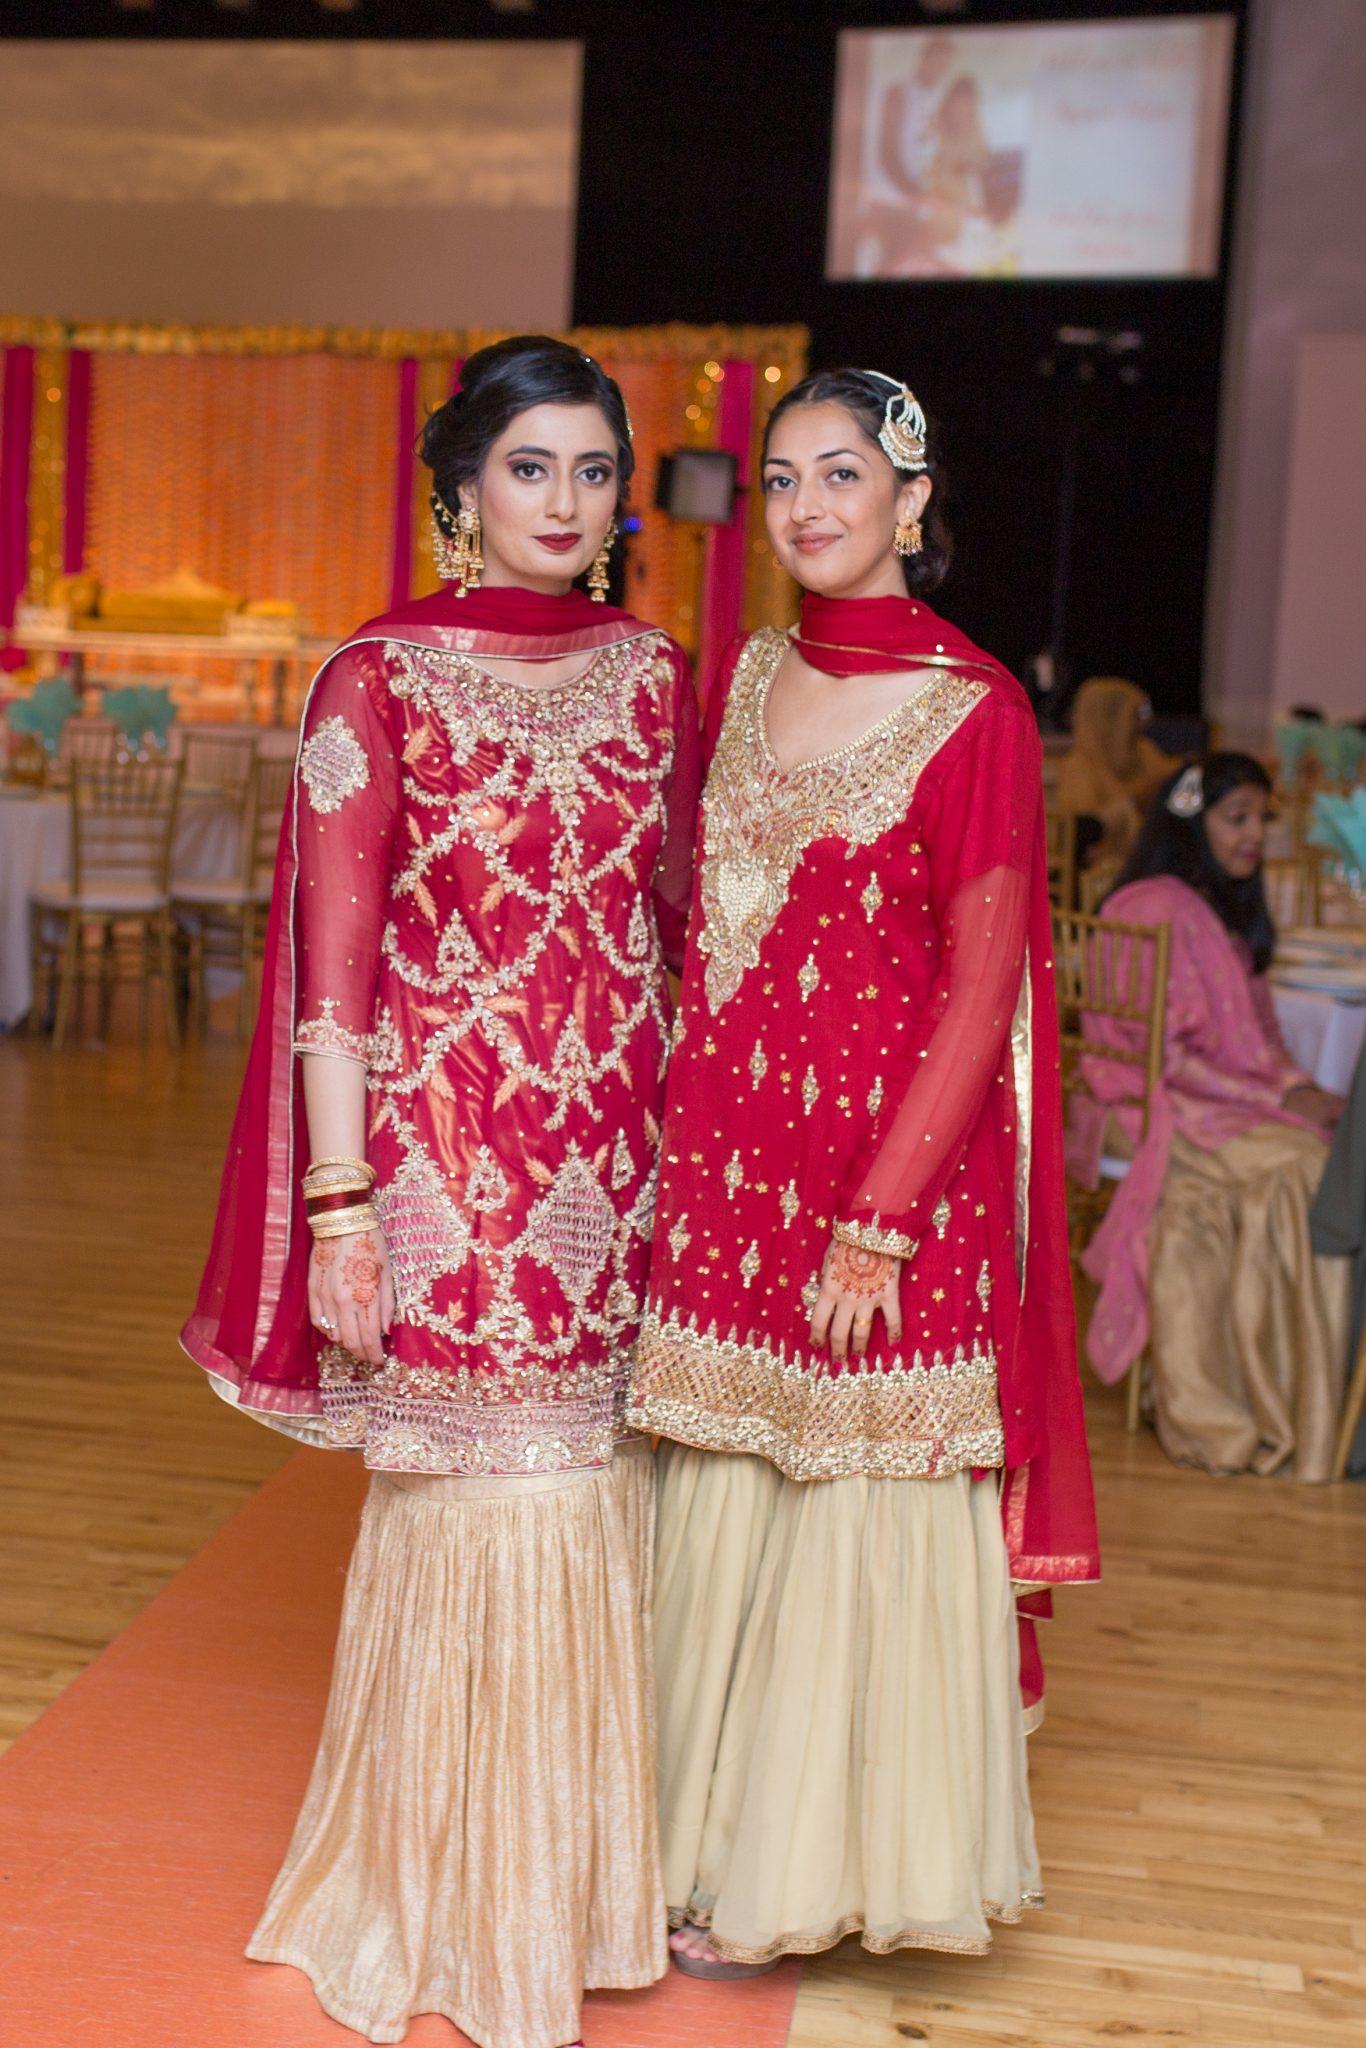 Brudepiker i et pakistansk bryllup